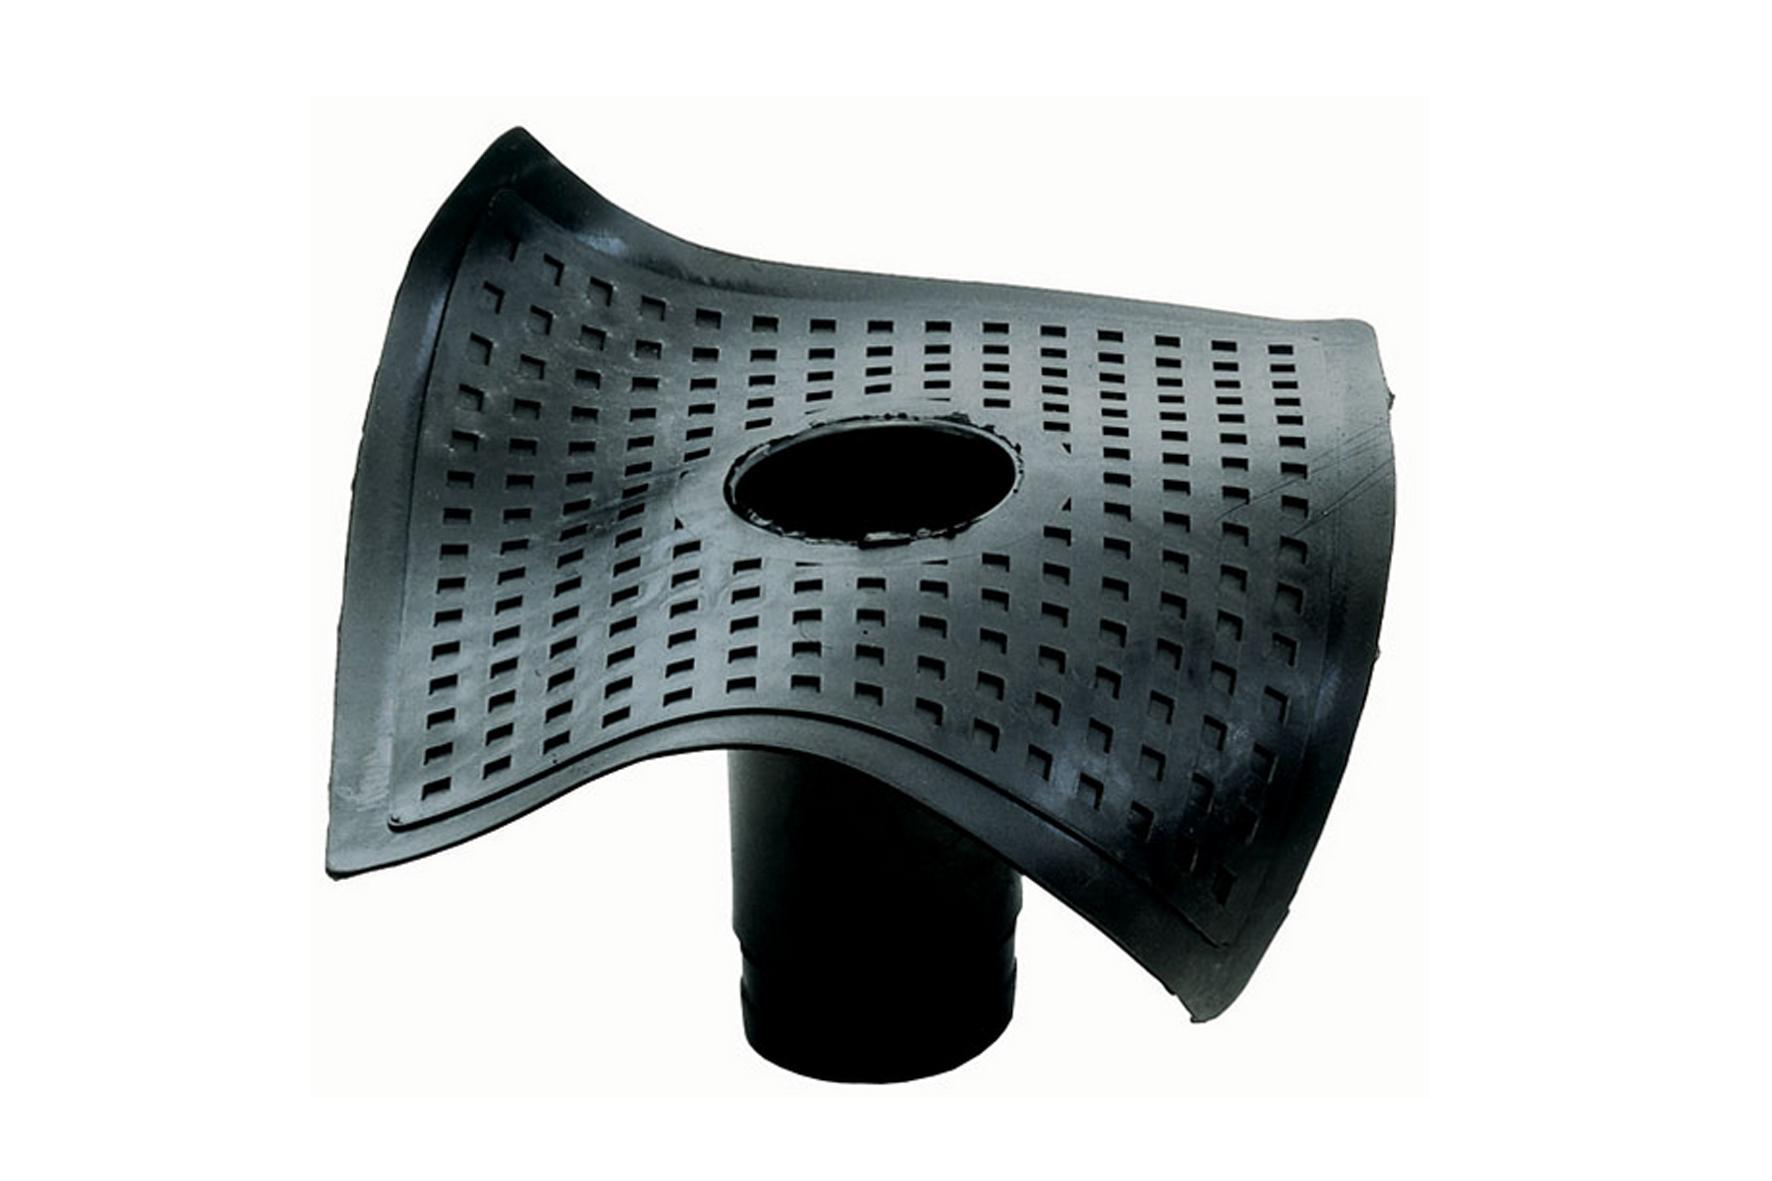 naissance epdm achat en ligne ou dans notre magasin. Black Bedroom Furniture Sets. Home Design Ideas